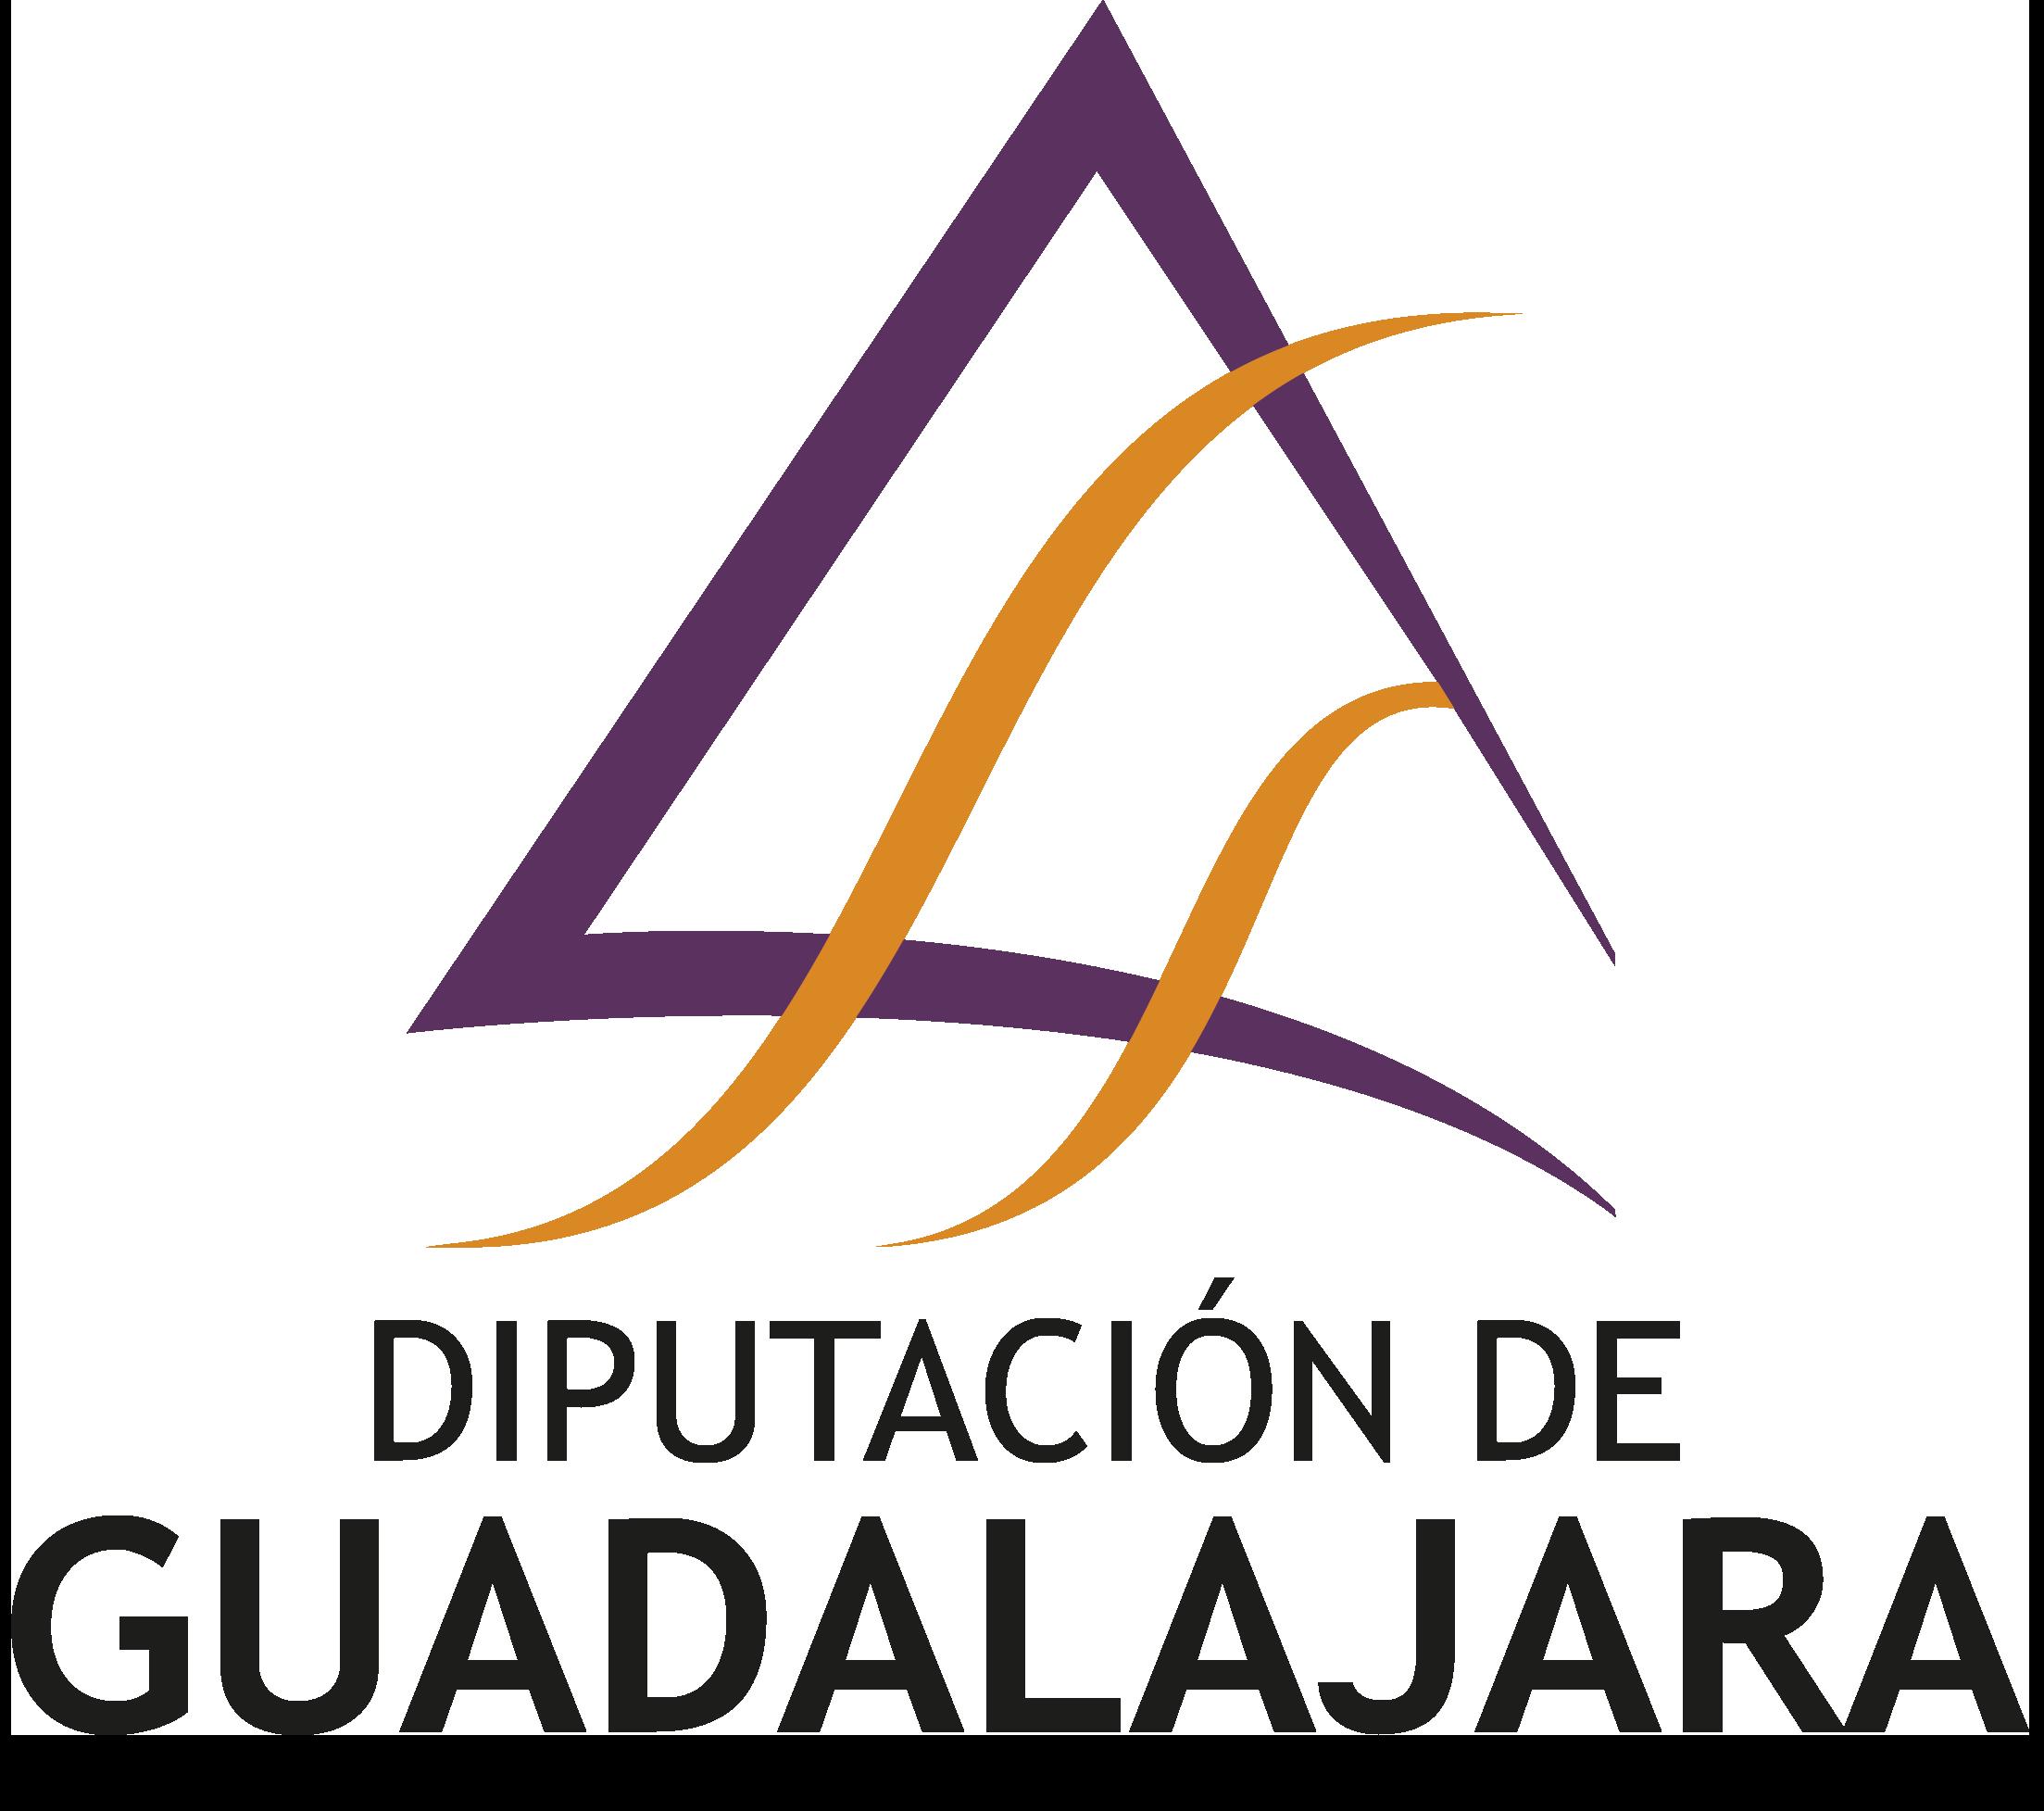 logo_vertical_Diputacion_transparente.png (133 KB)